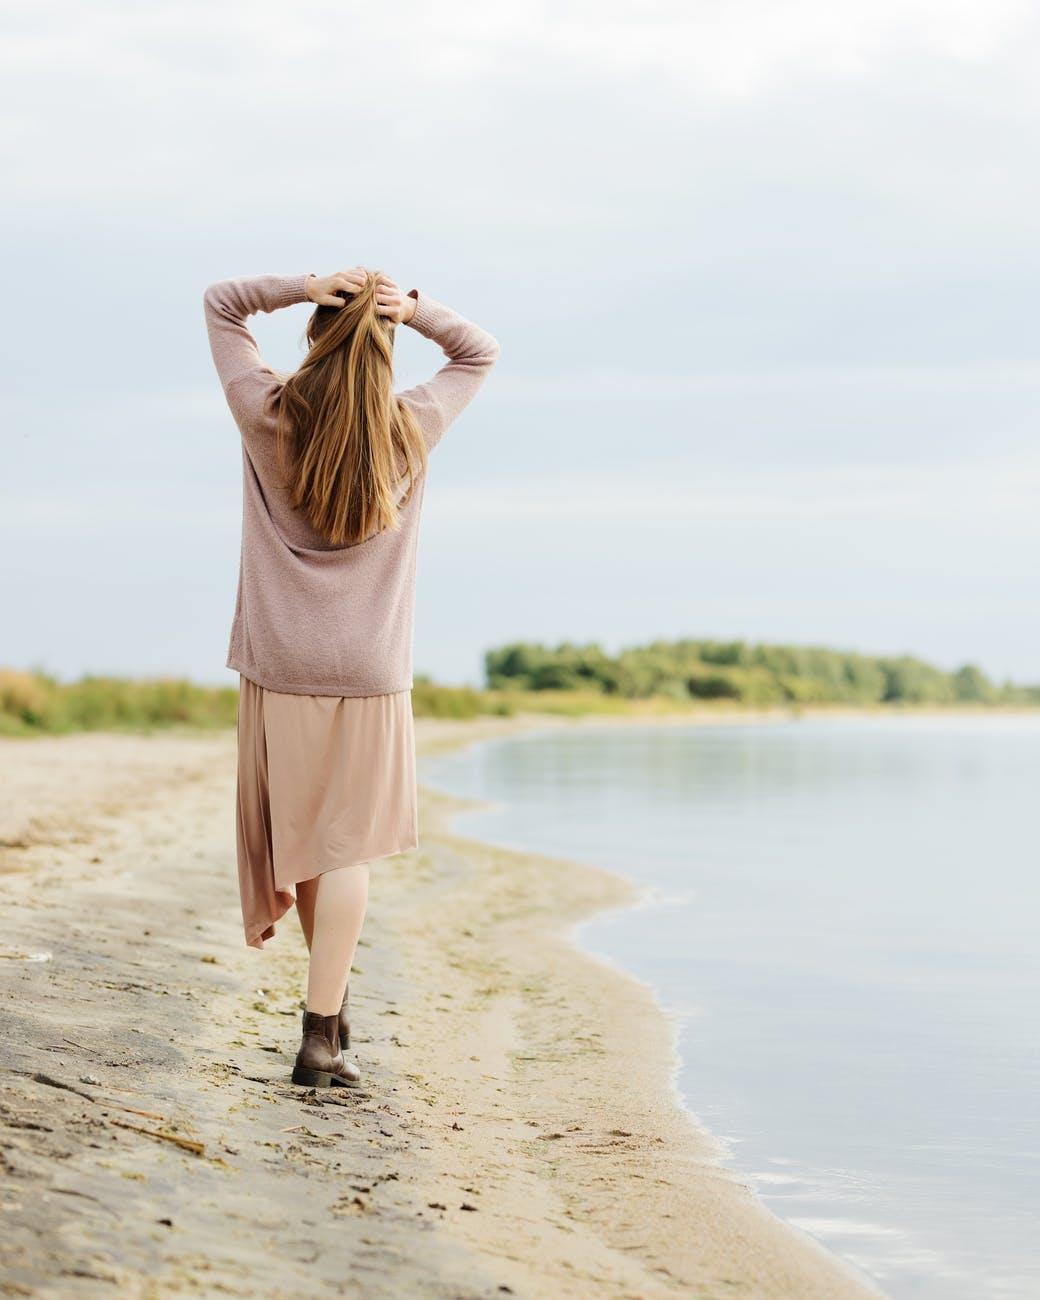 woman walking on a lakeshore